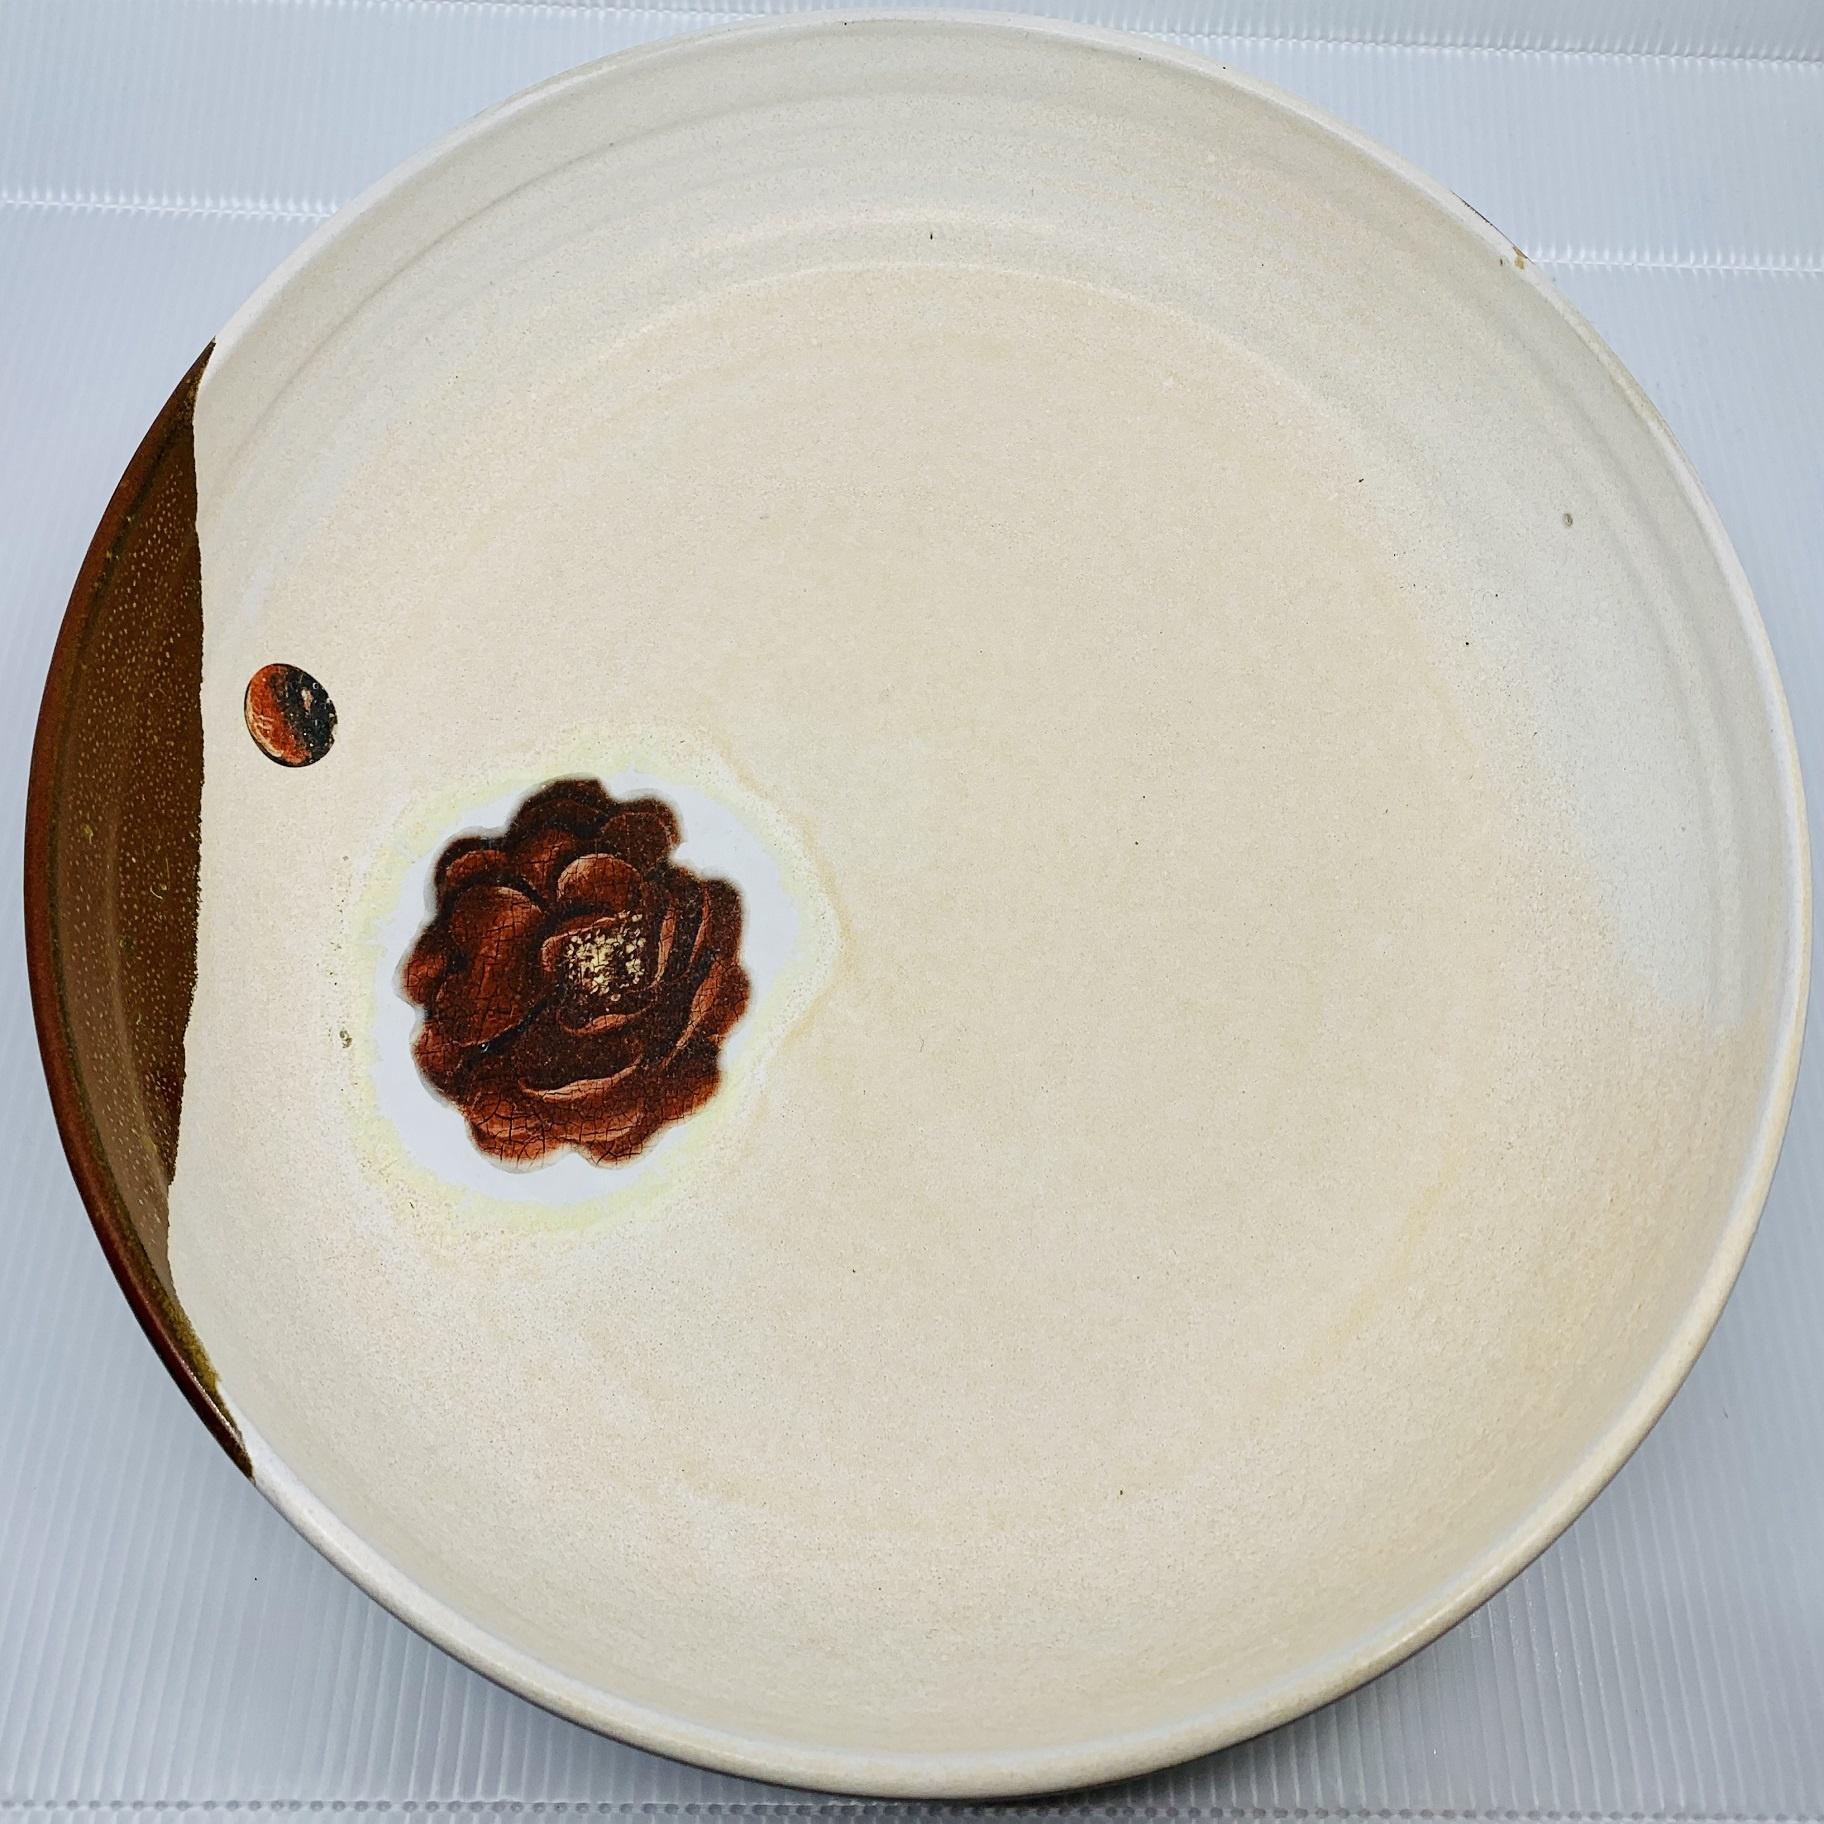 Atelier Caro-K Unique handmade ceramic dish with a detail from the Ghent Altarpiece - Atelier Caro-K - Diameter 35 cm